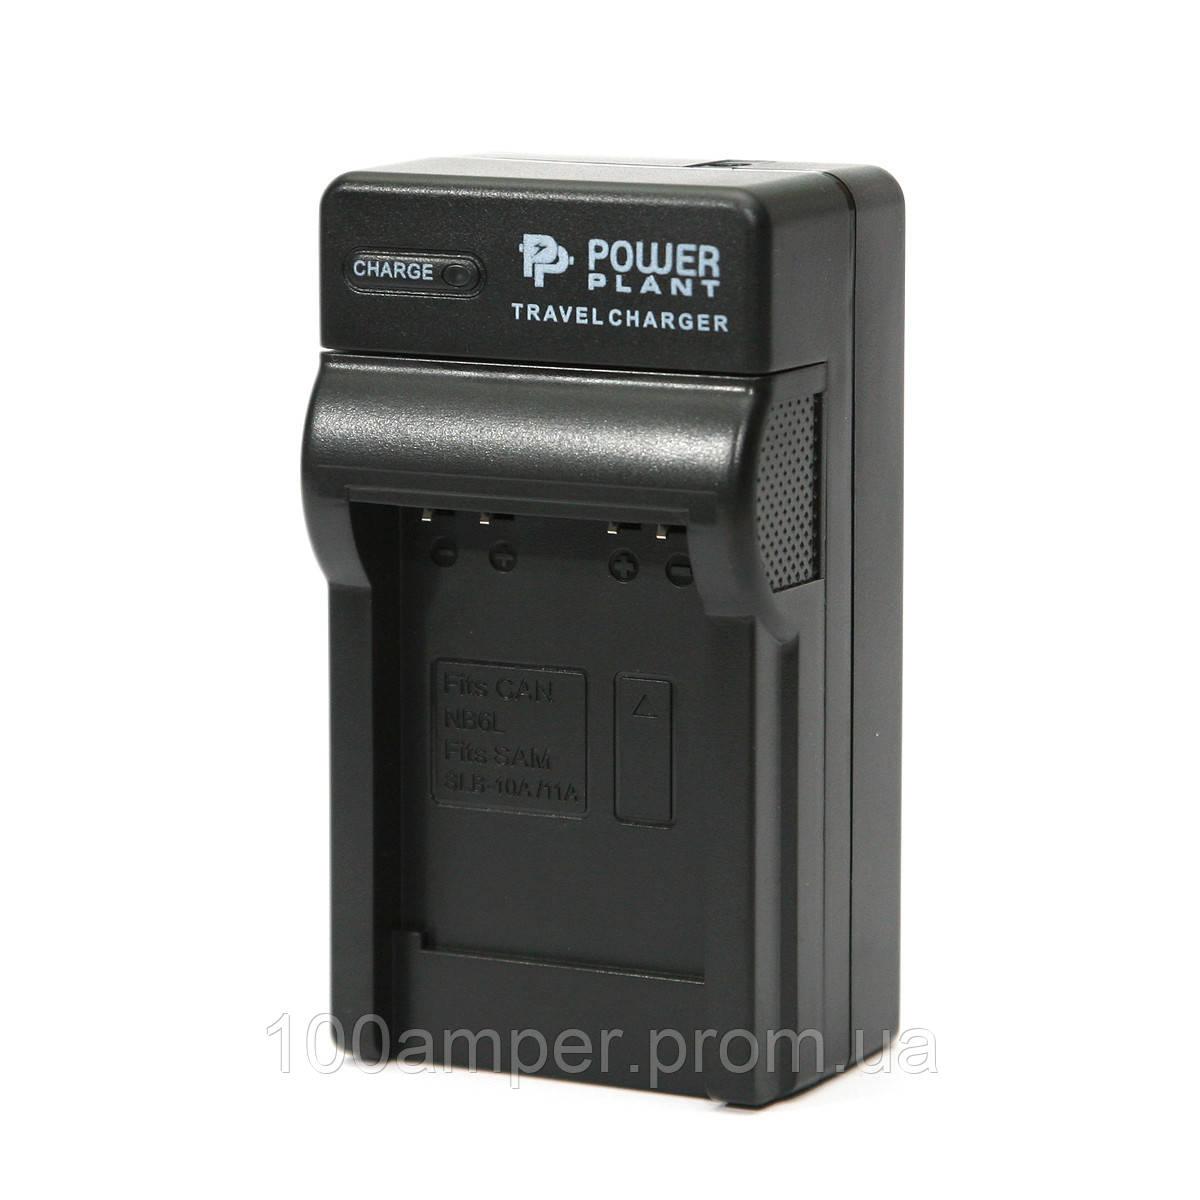 Сетевое зарядное устройство PowerPlant Samsung SLB-11A